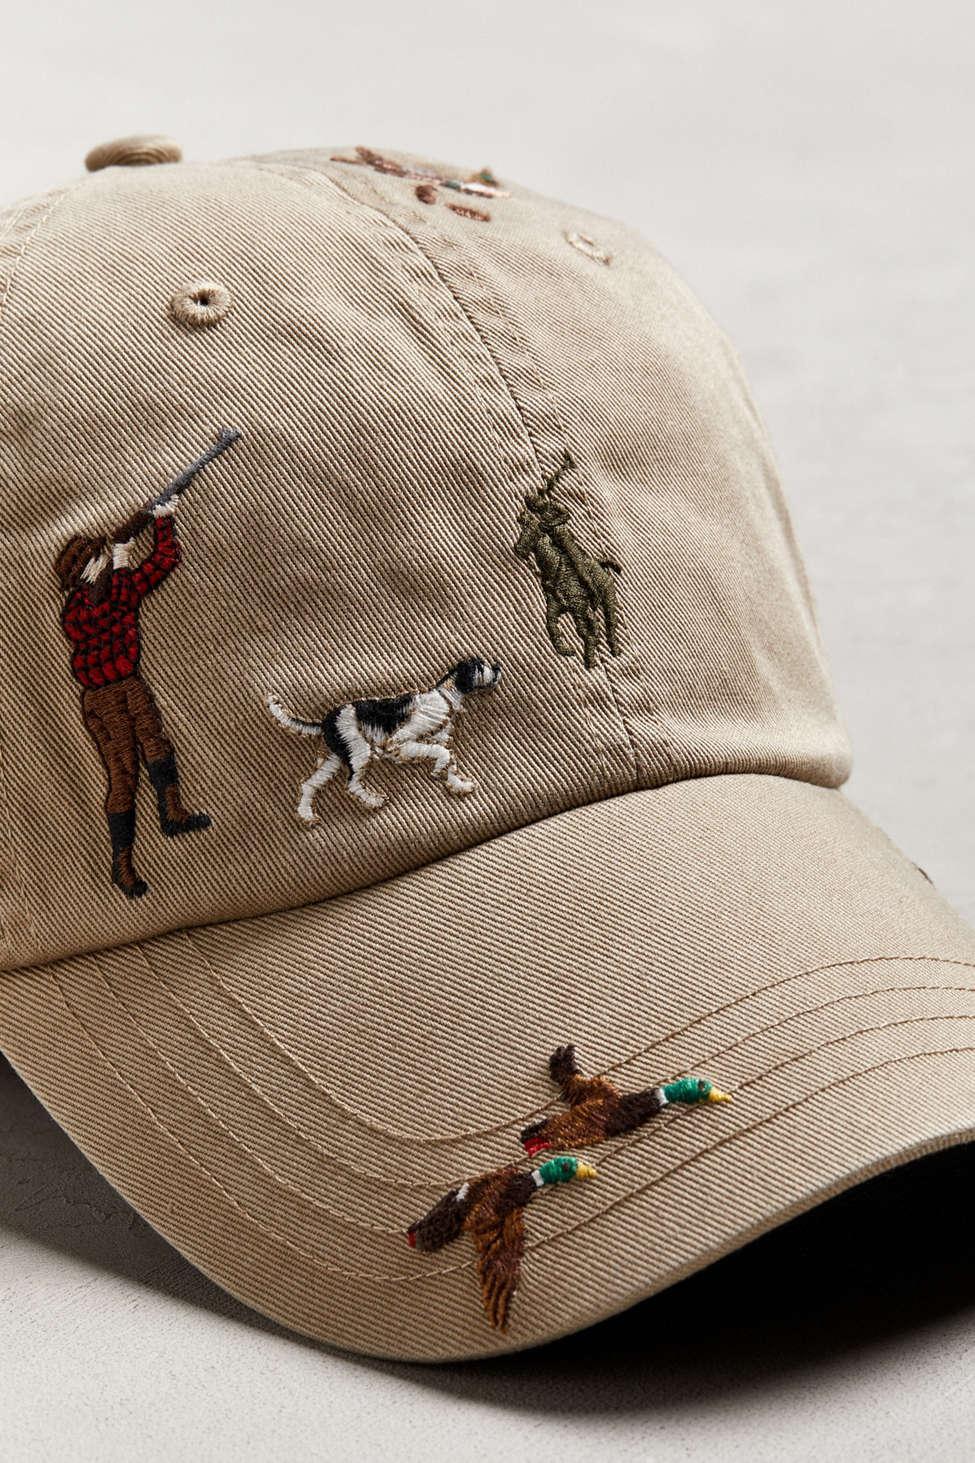 Polo Ralph Lauren - Brown Embroidered Classic Sport Baseball Hat for Men -  Lyst. View fullscreen 818ebea86f64